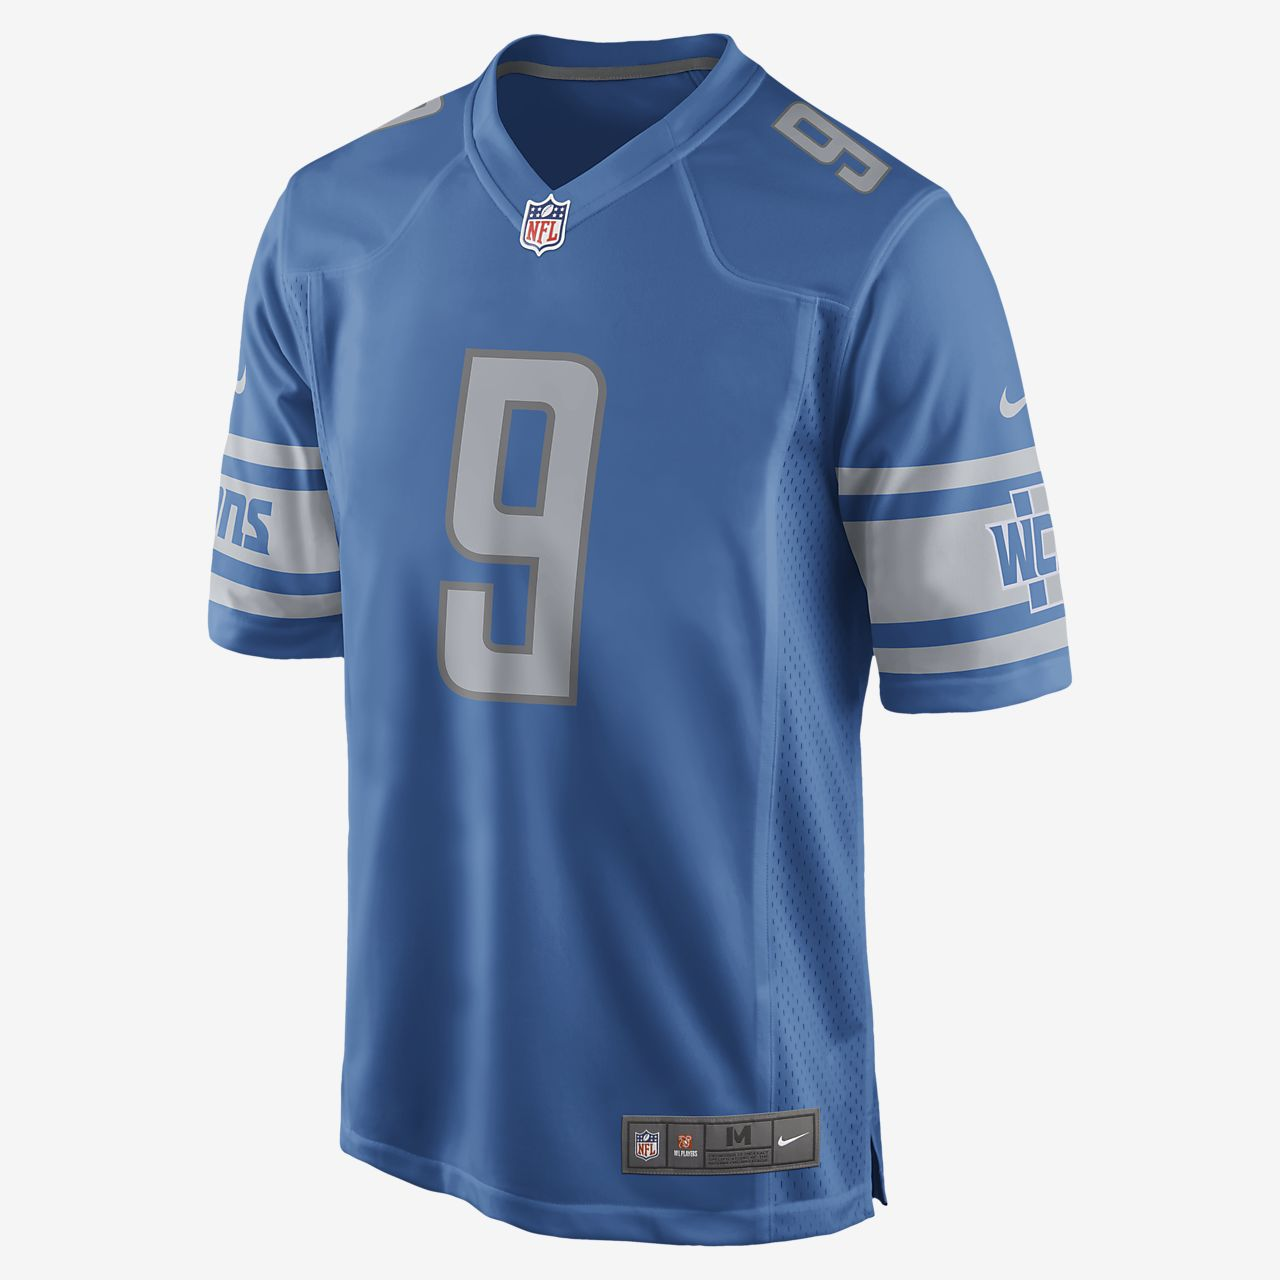 NFL Detroit Lions (Matthew Stafford) Men's Game American Football Jersey